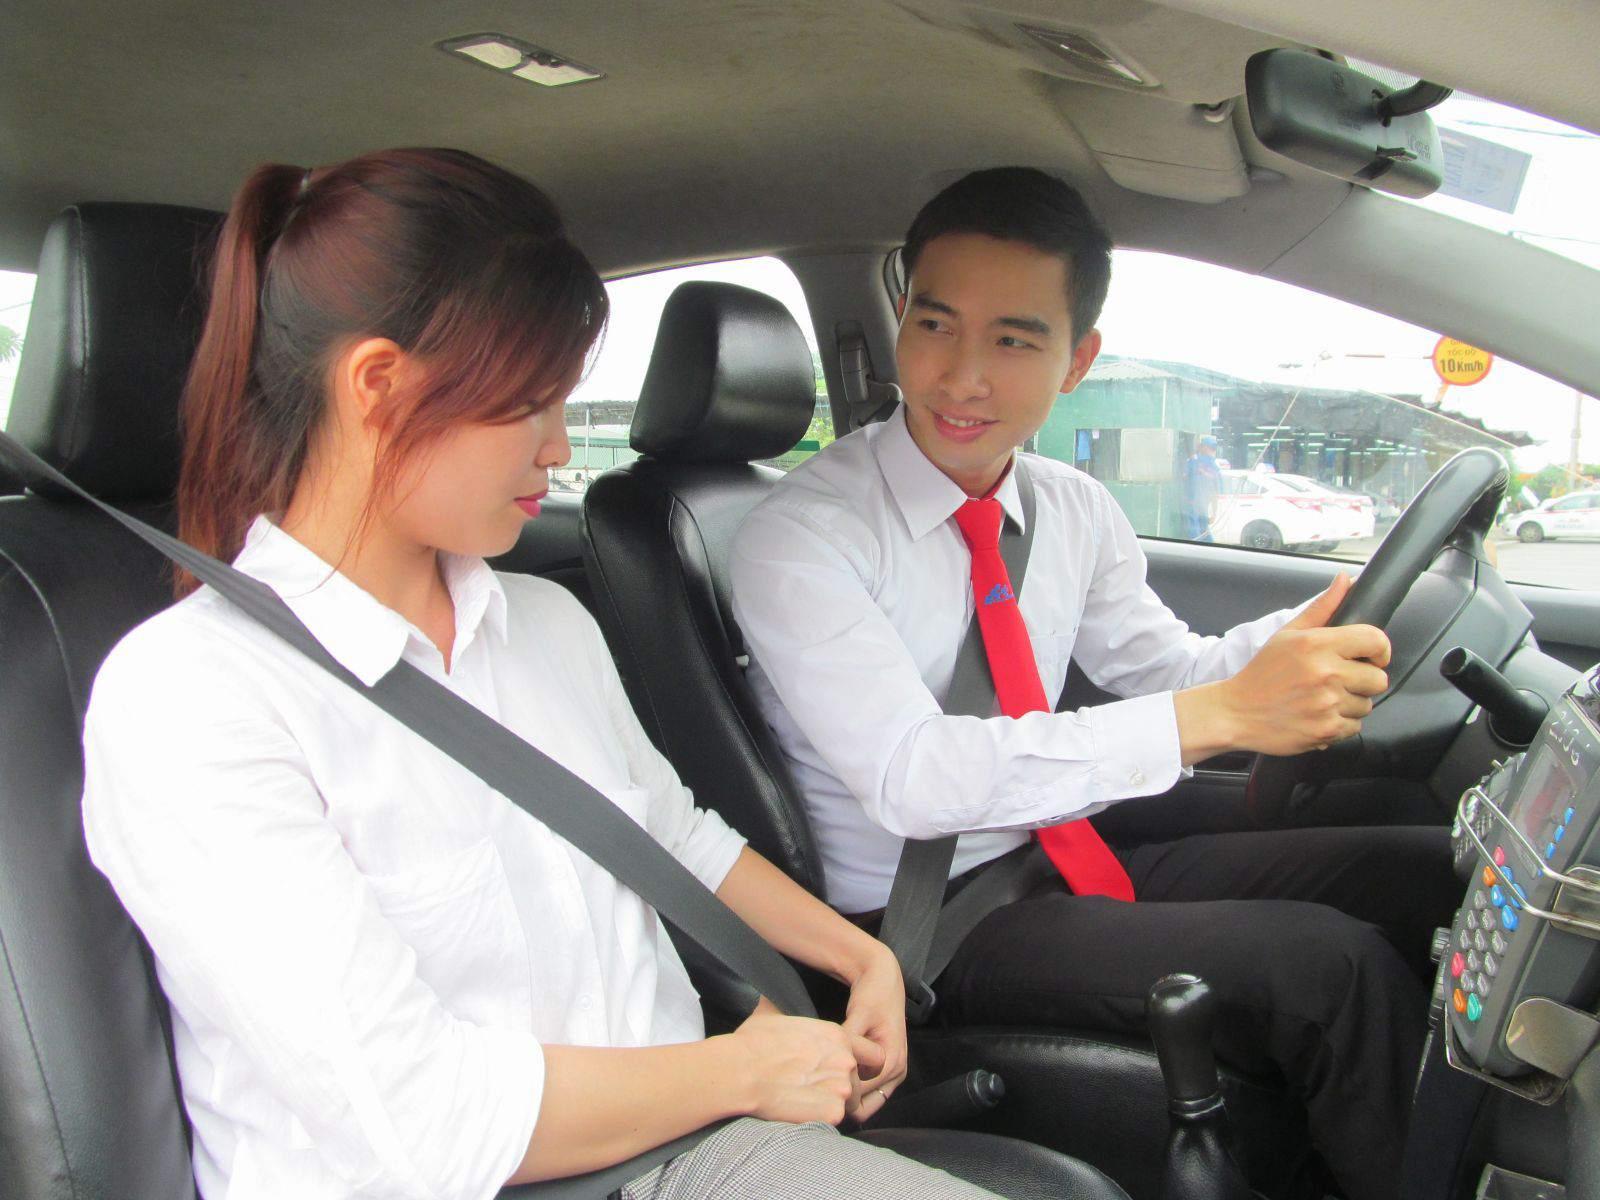 lai xe taxi that day an toan - Taxi Group tuyển lái xe tháng 9 năm 2015